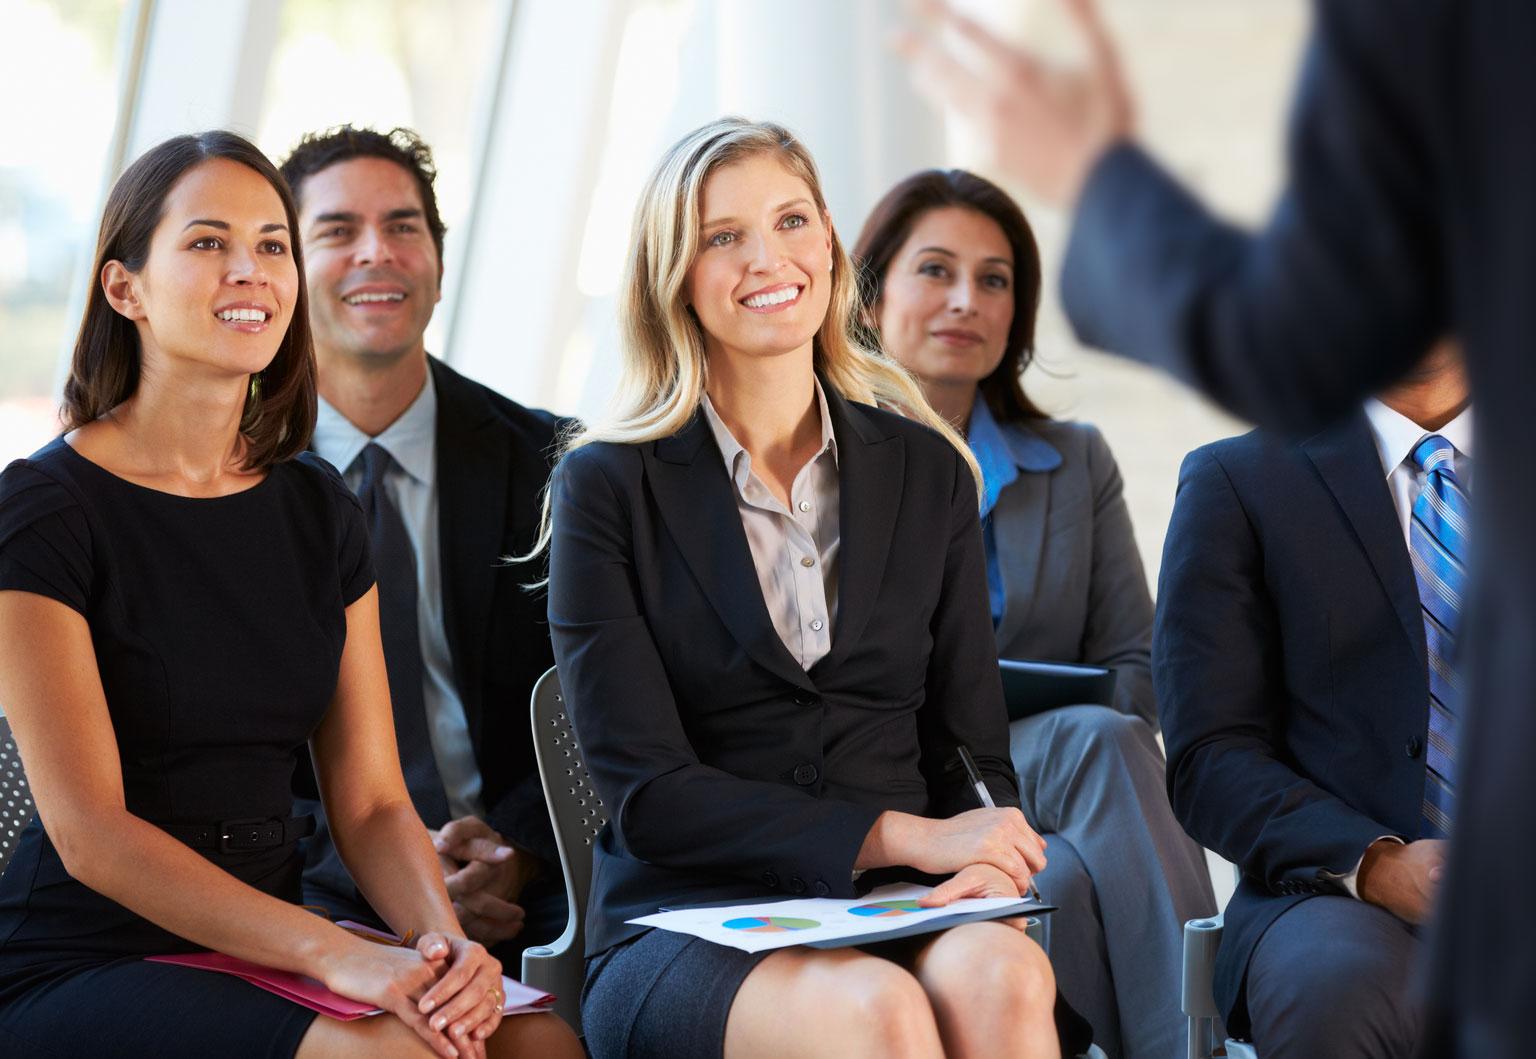 fulton_market_consulting_speaking_engagements.jpg